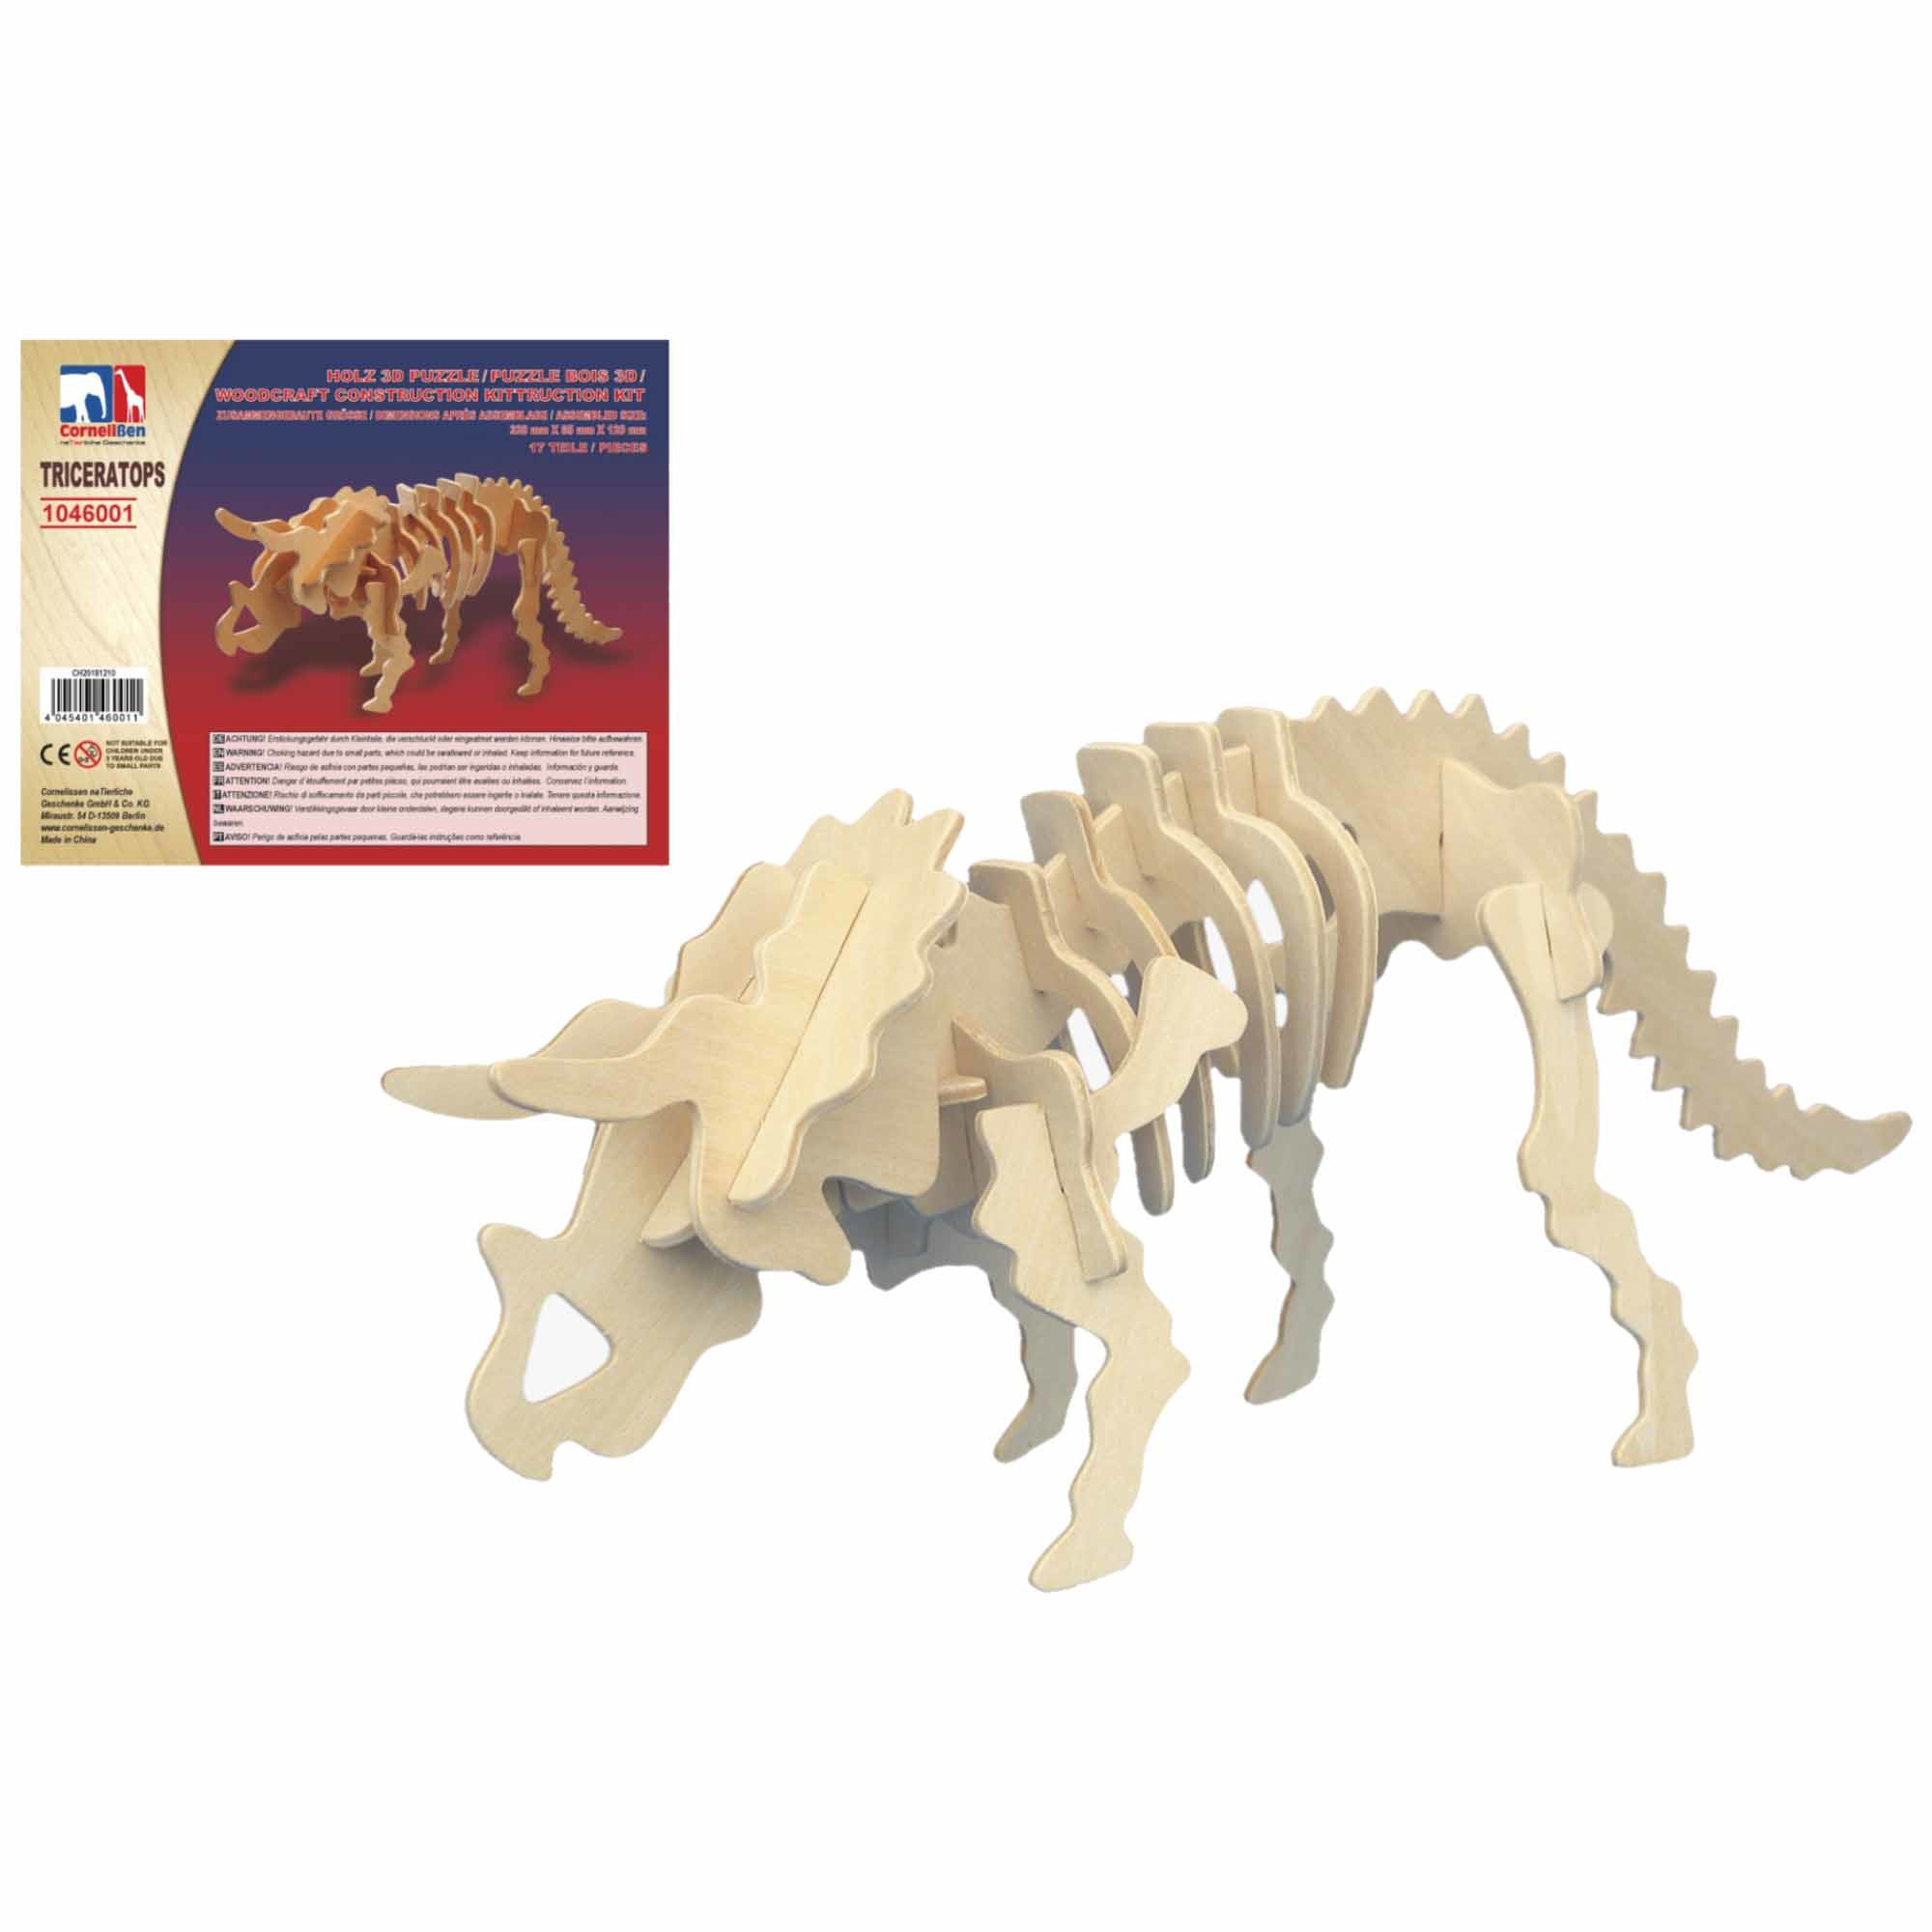 Houten 3D puzzel Triceratops dinosaurus 32 cm